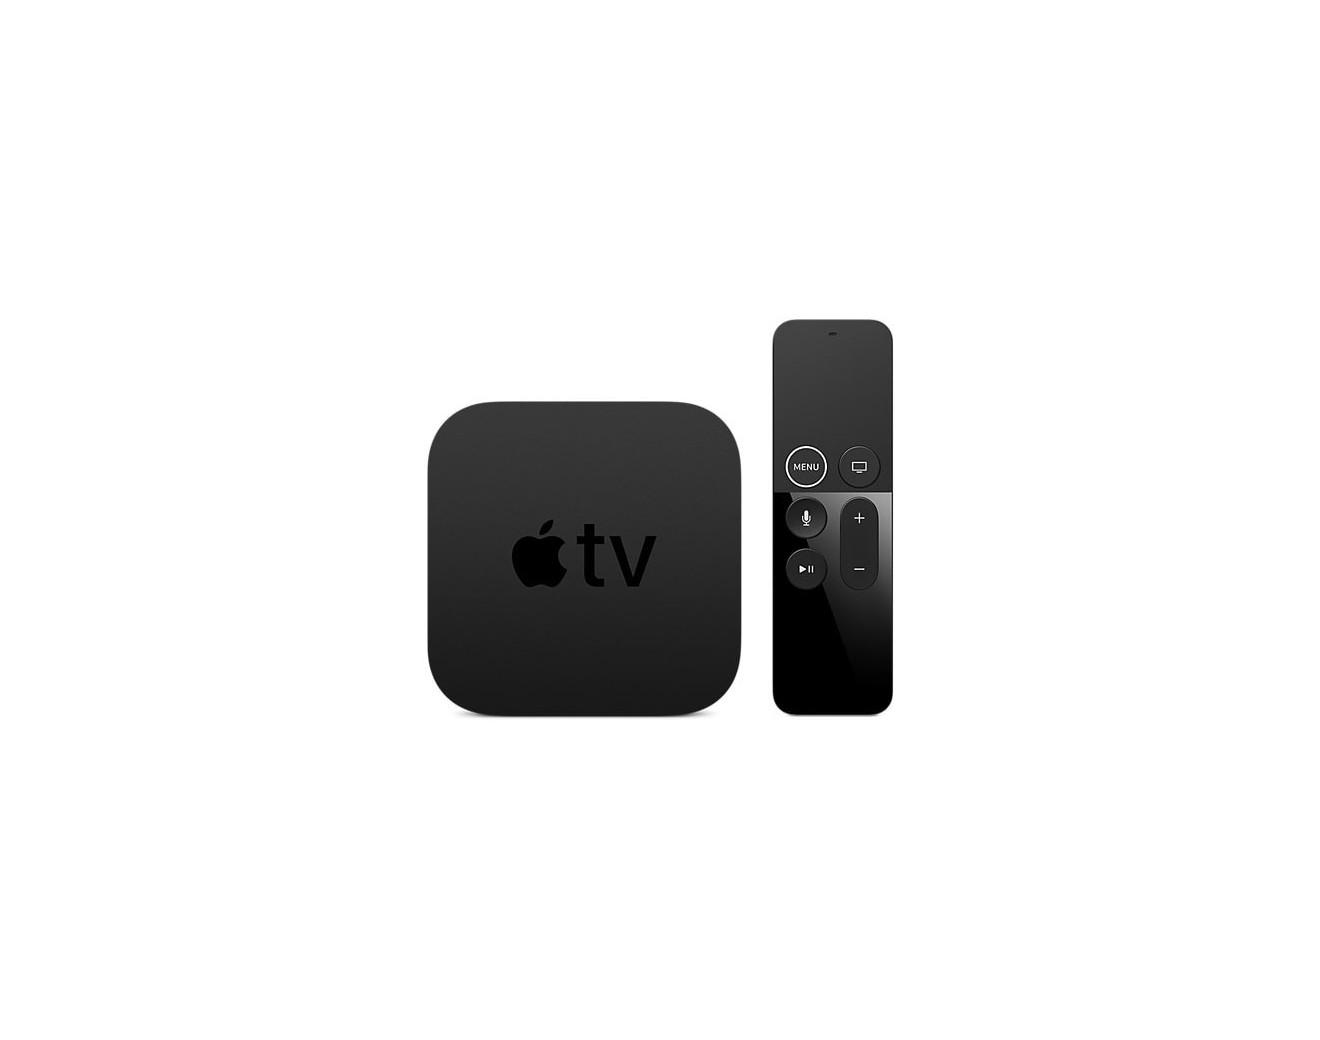 Apple TV 4K (2017) - 64 GB